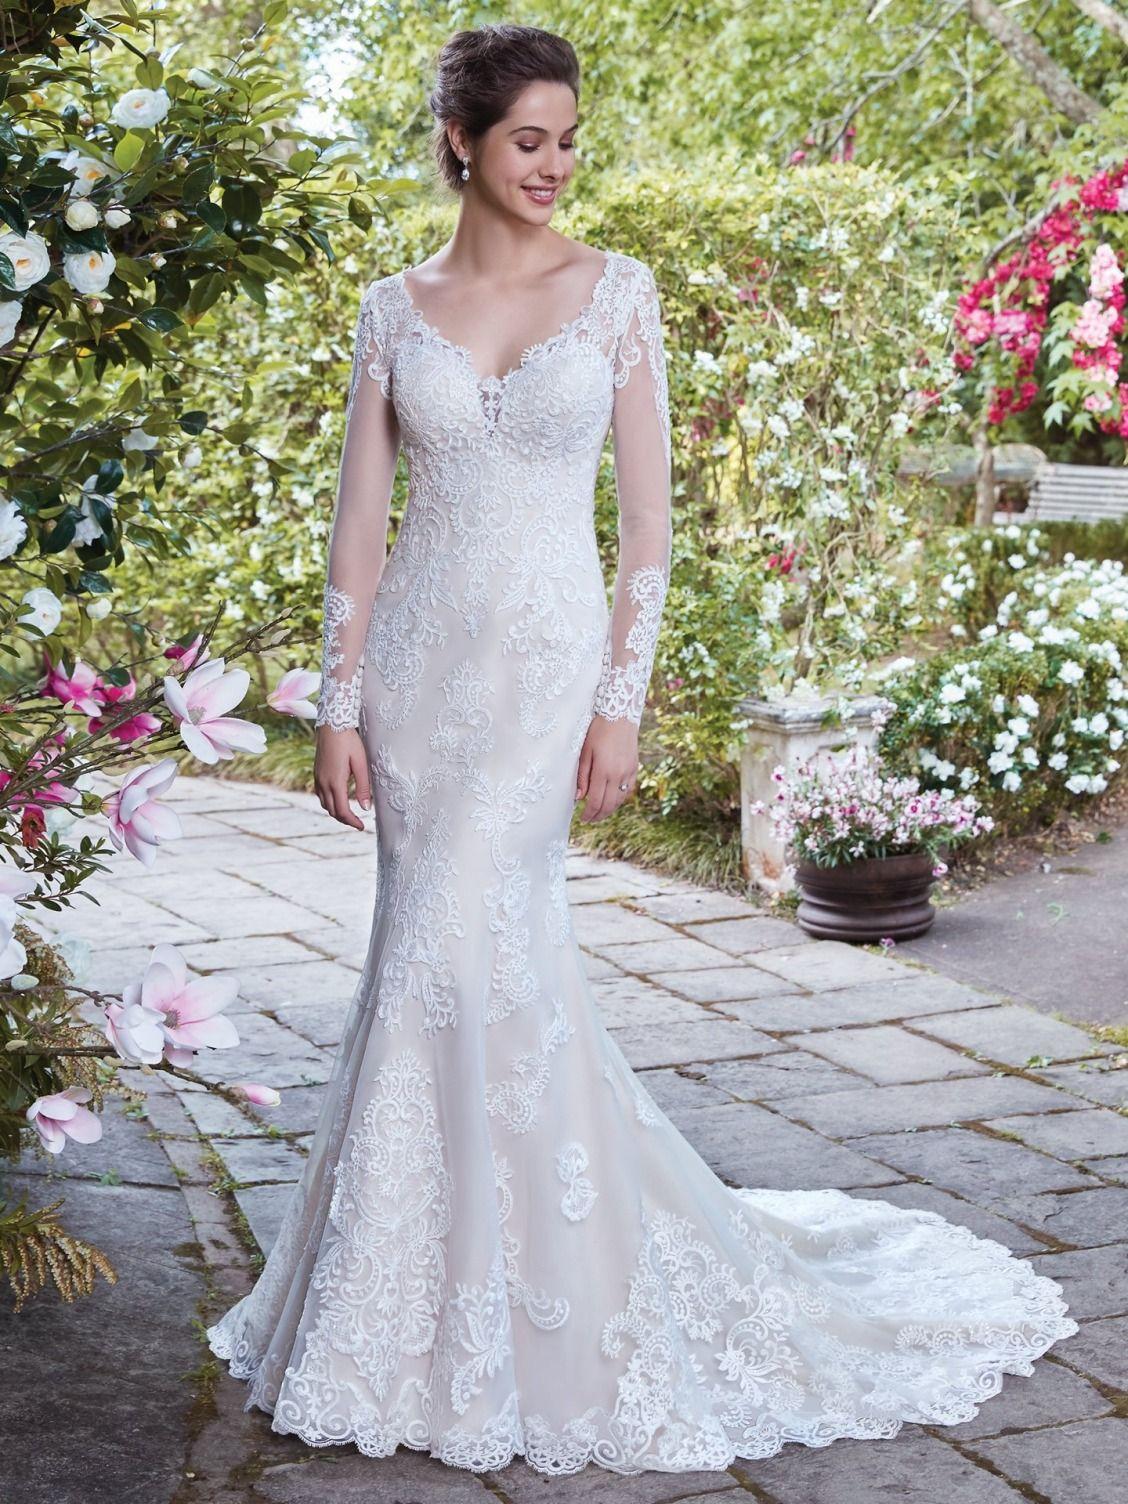 191c198d88 MAEVE by Rebecca Ingram Wedding Dresses in 2019